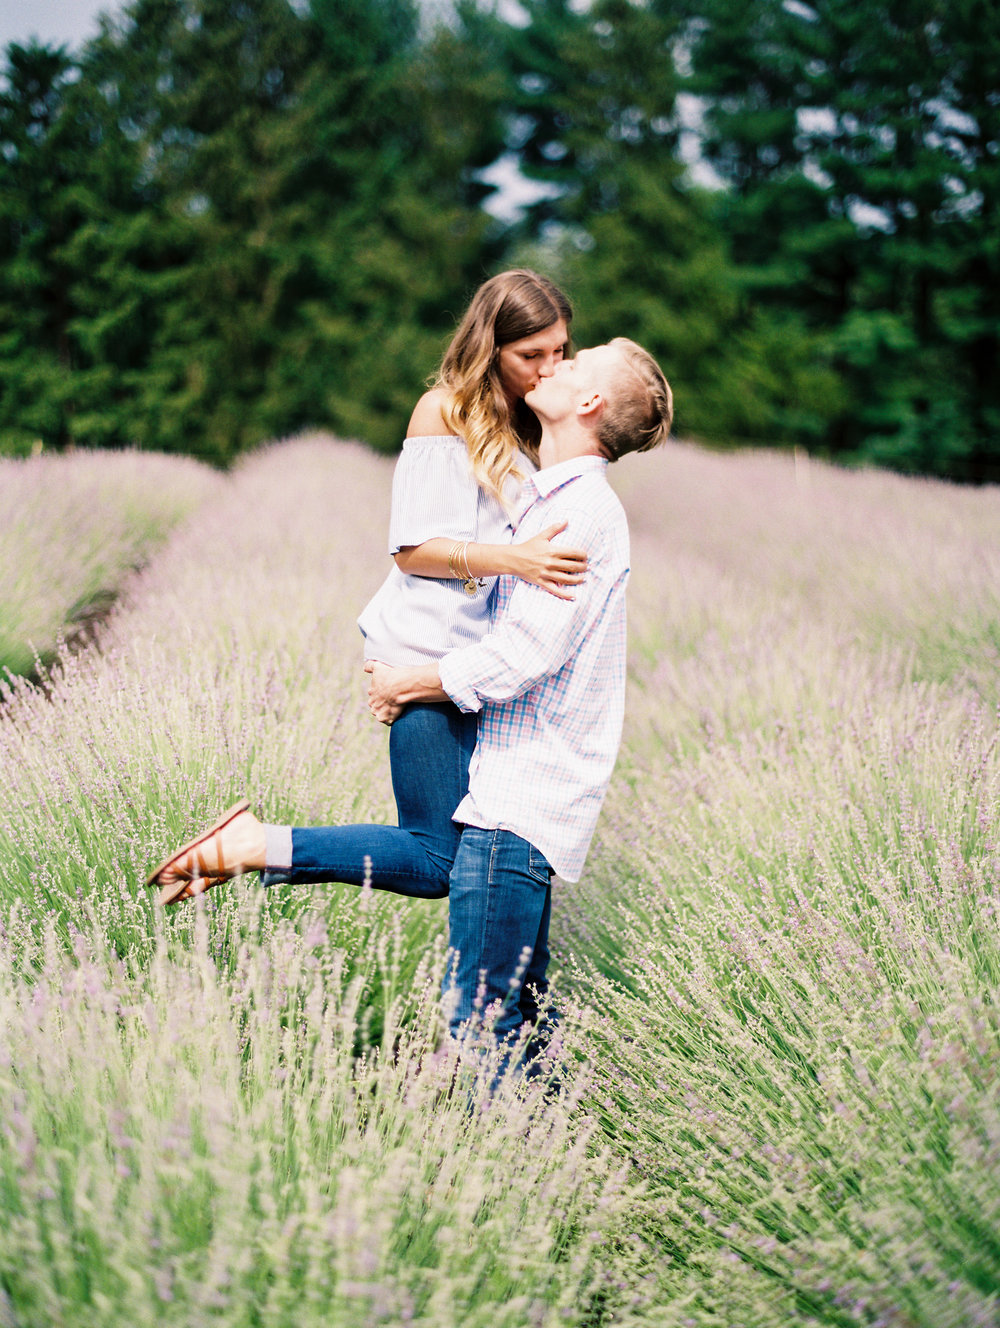 Kerri+Austin+Lavender+Field+Engagement-26.jpg